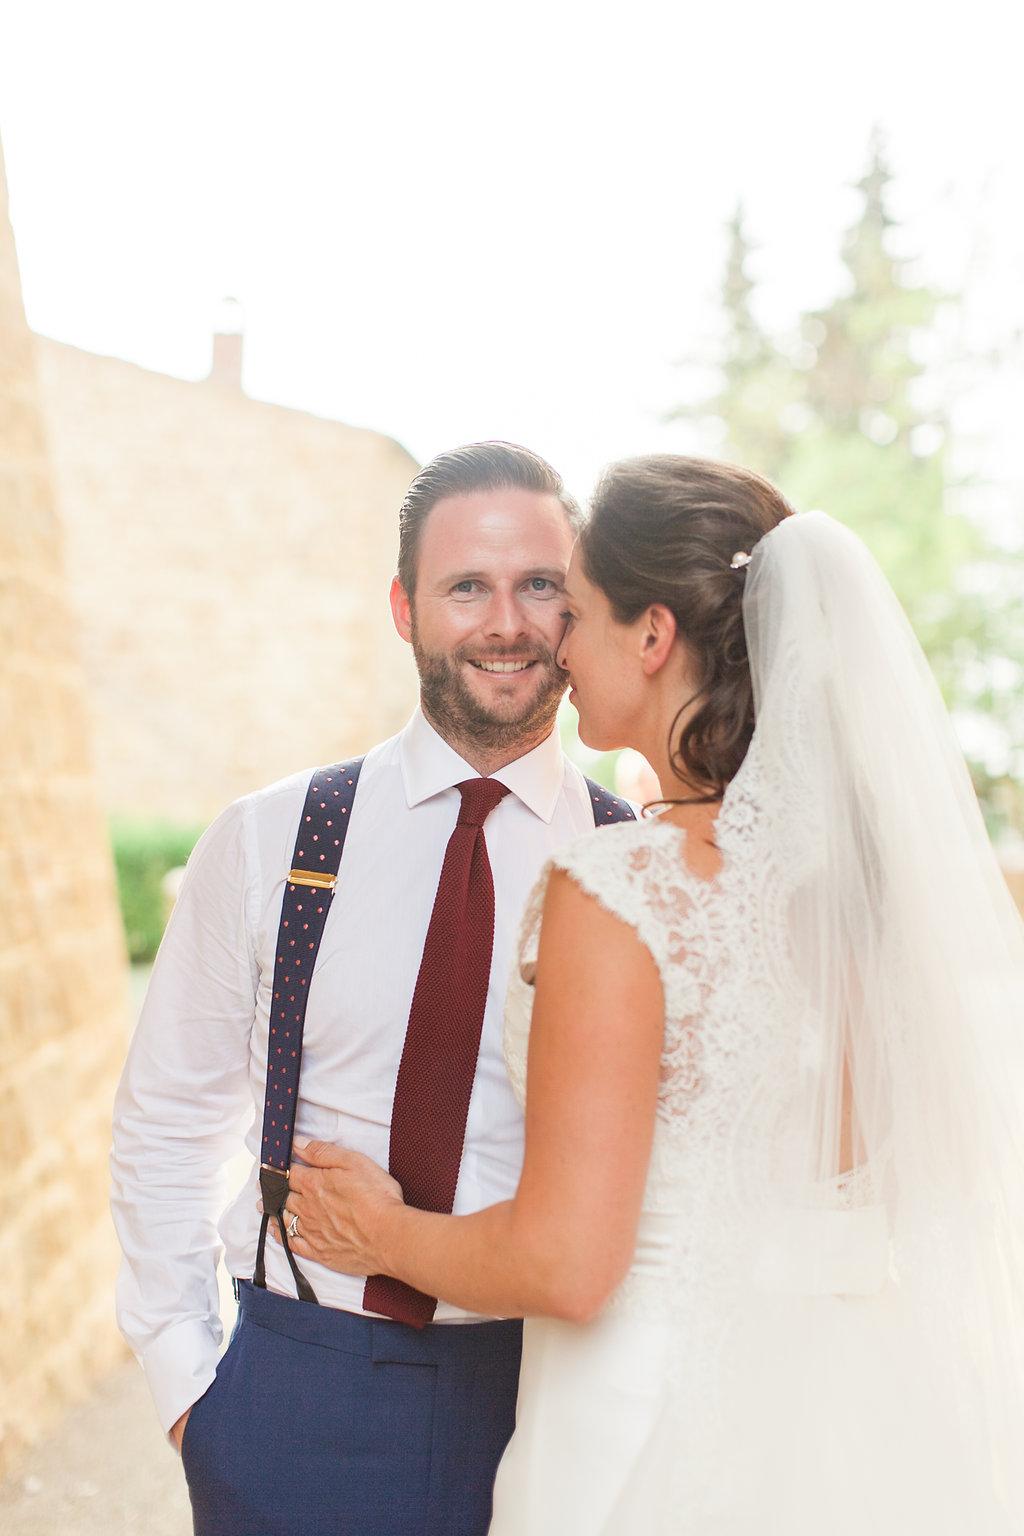 castelfalfi-tuscany-wedding-photographer-roberta-facchini-382